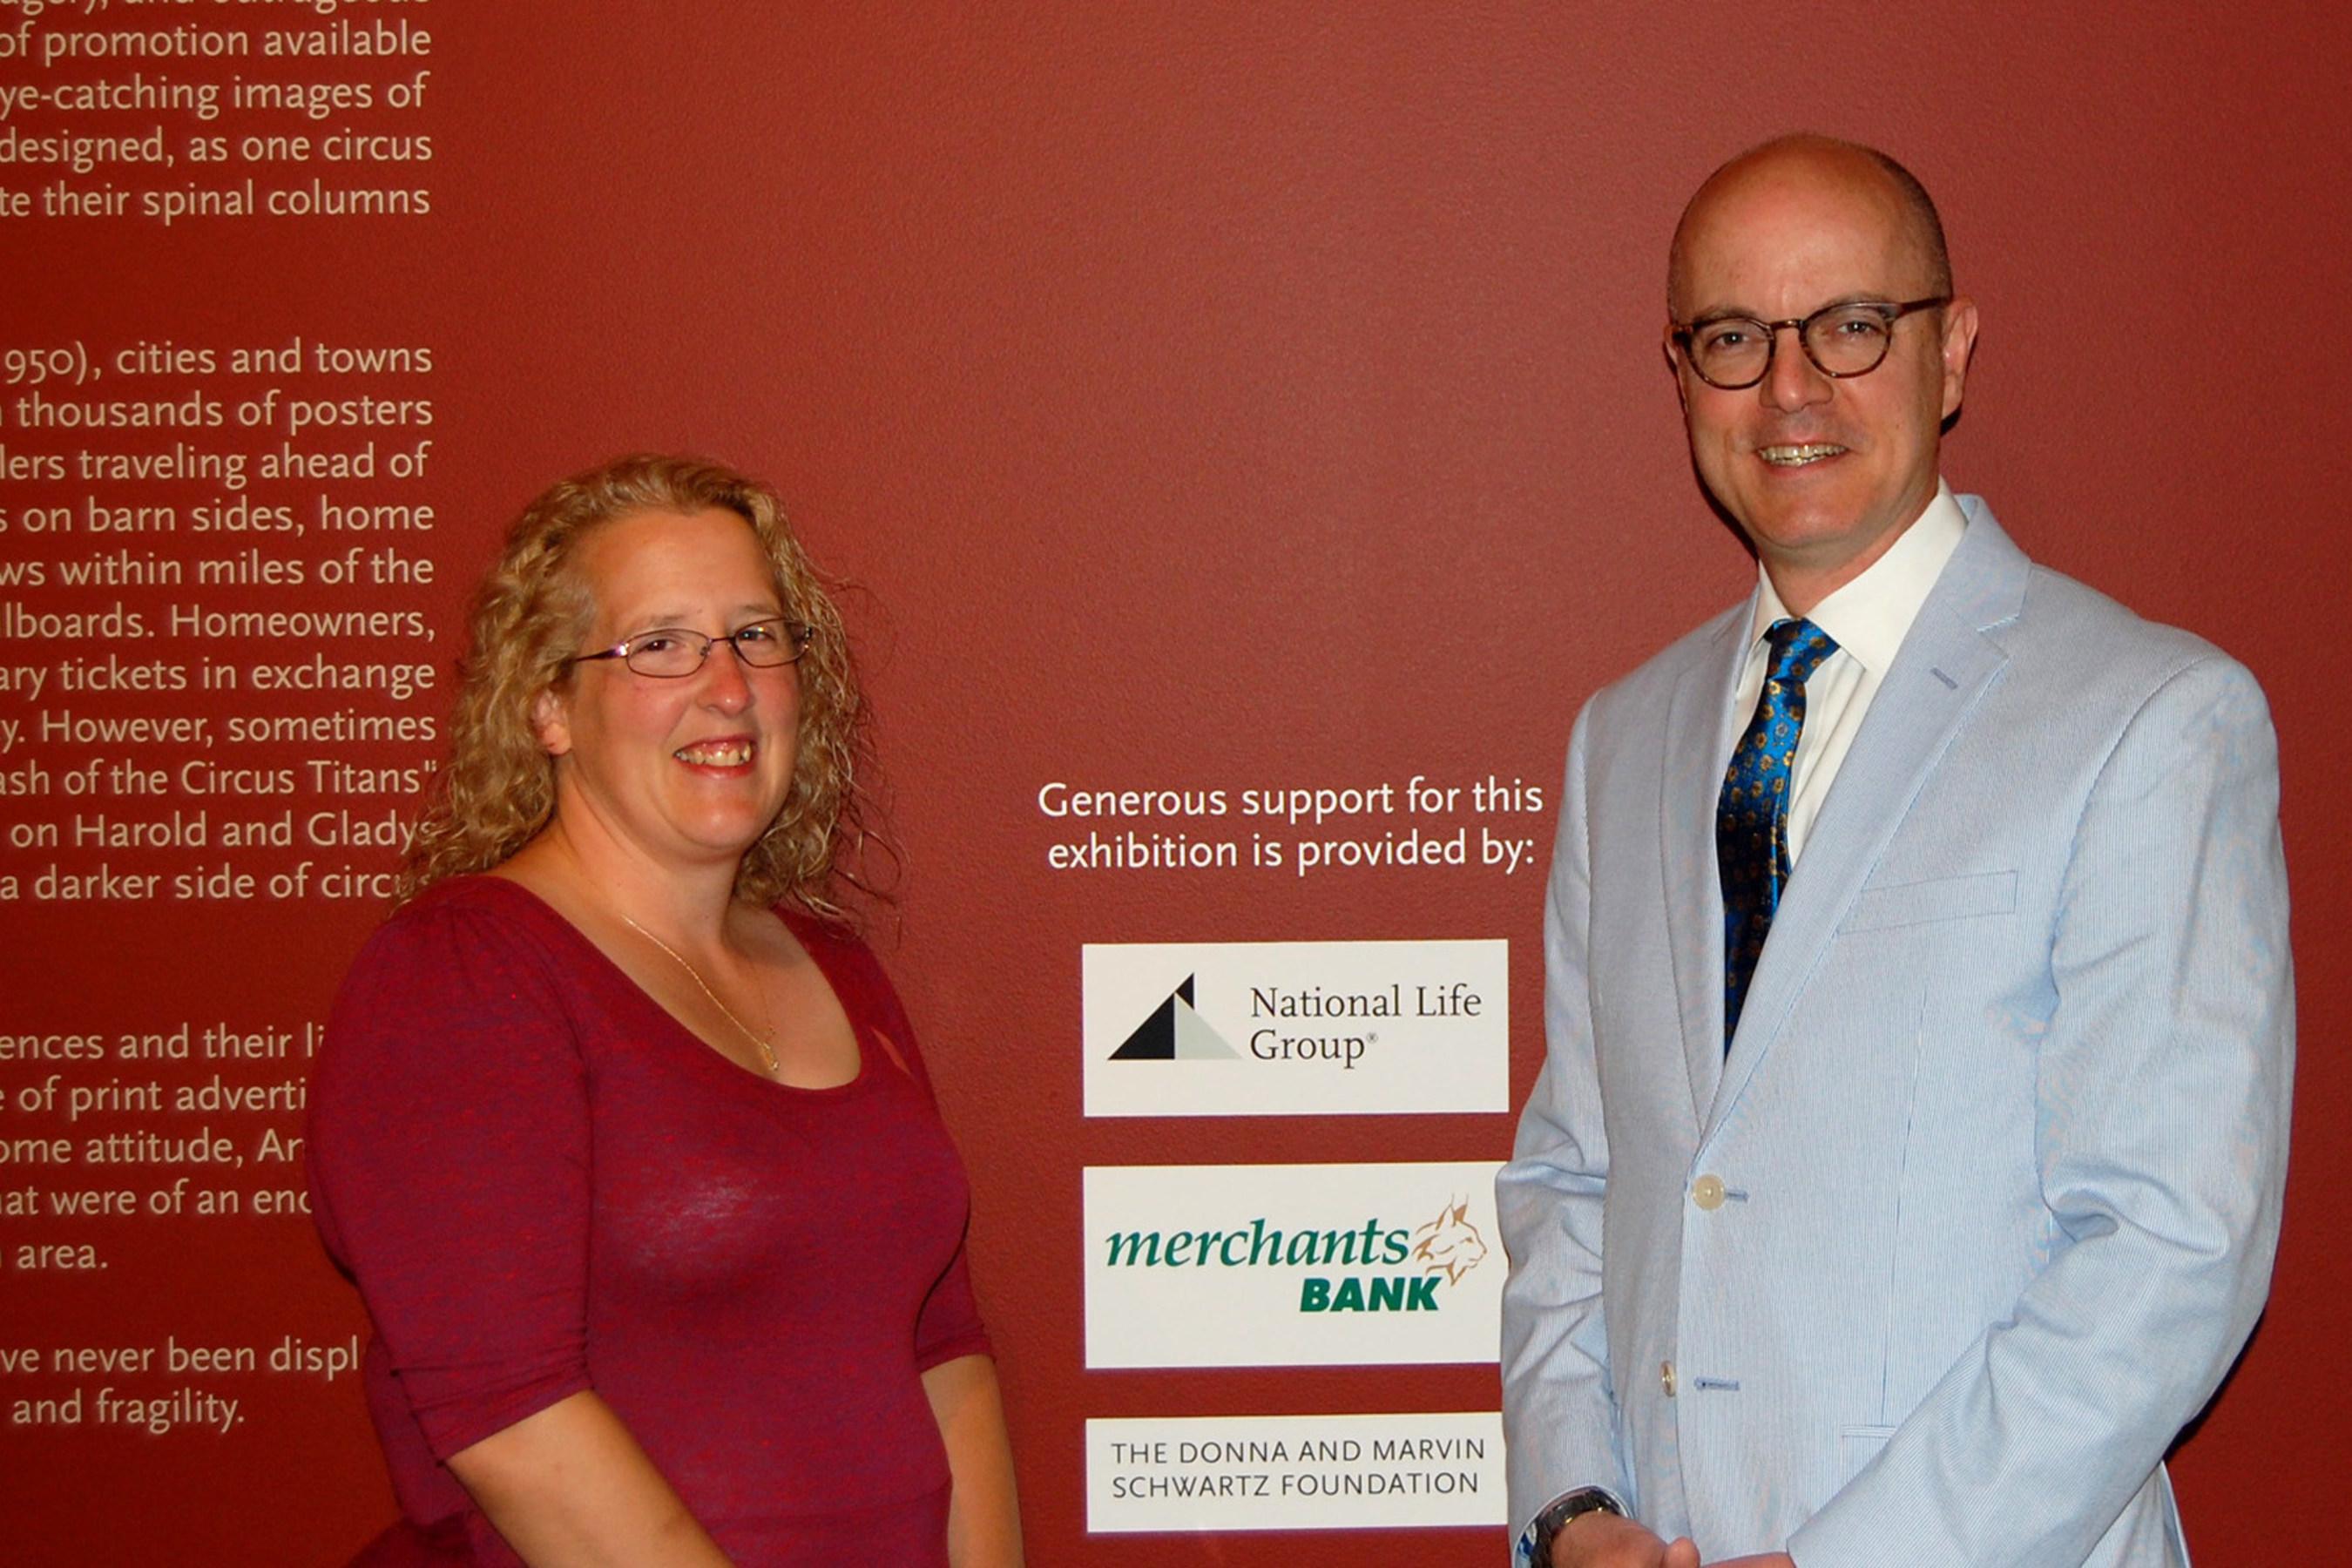 Maryann Russell, Community Banking Manager Merchants Bank; David Huntington, Development Officer, Grants and Endowments, Shelburne Museum